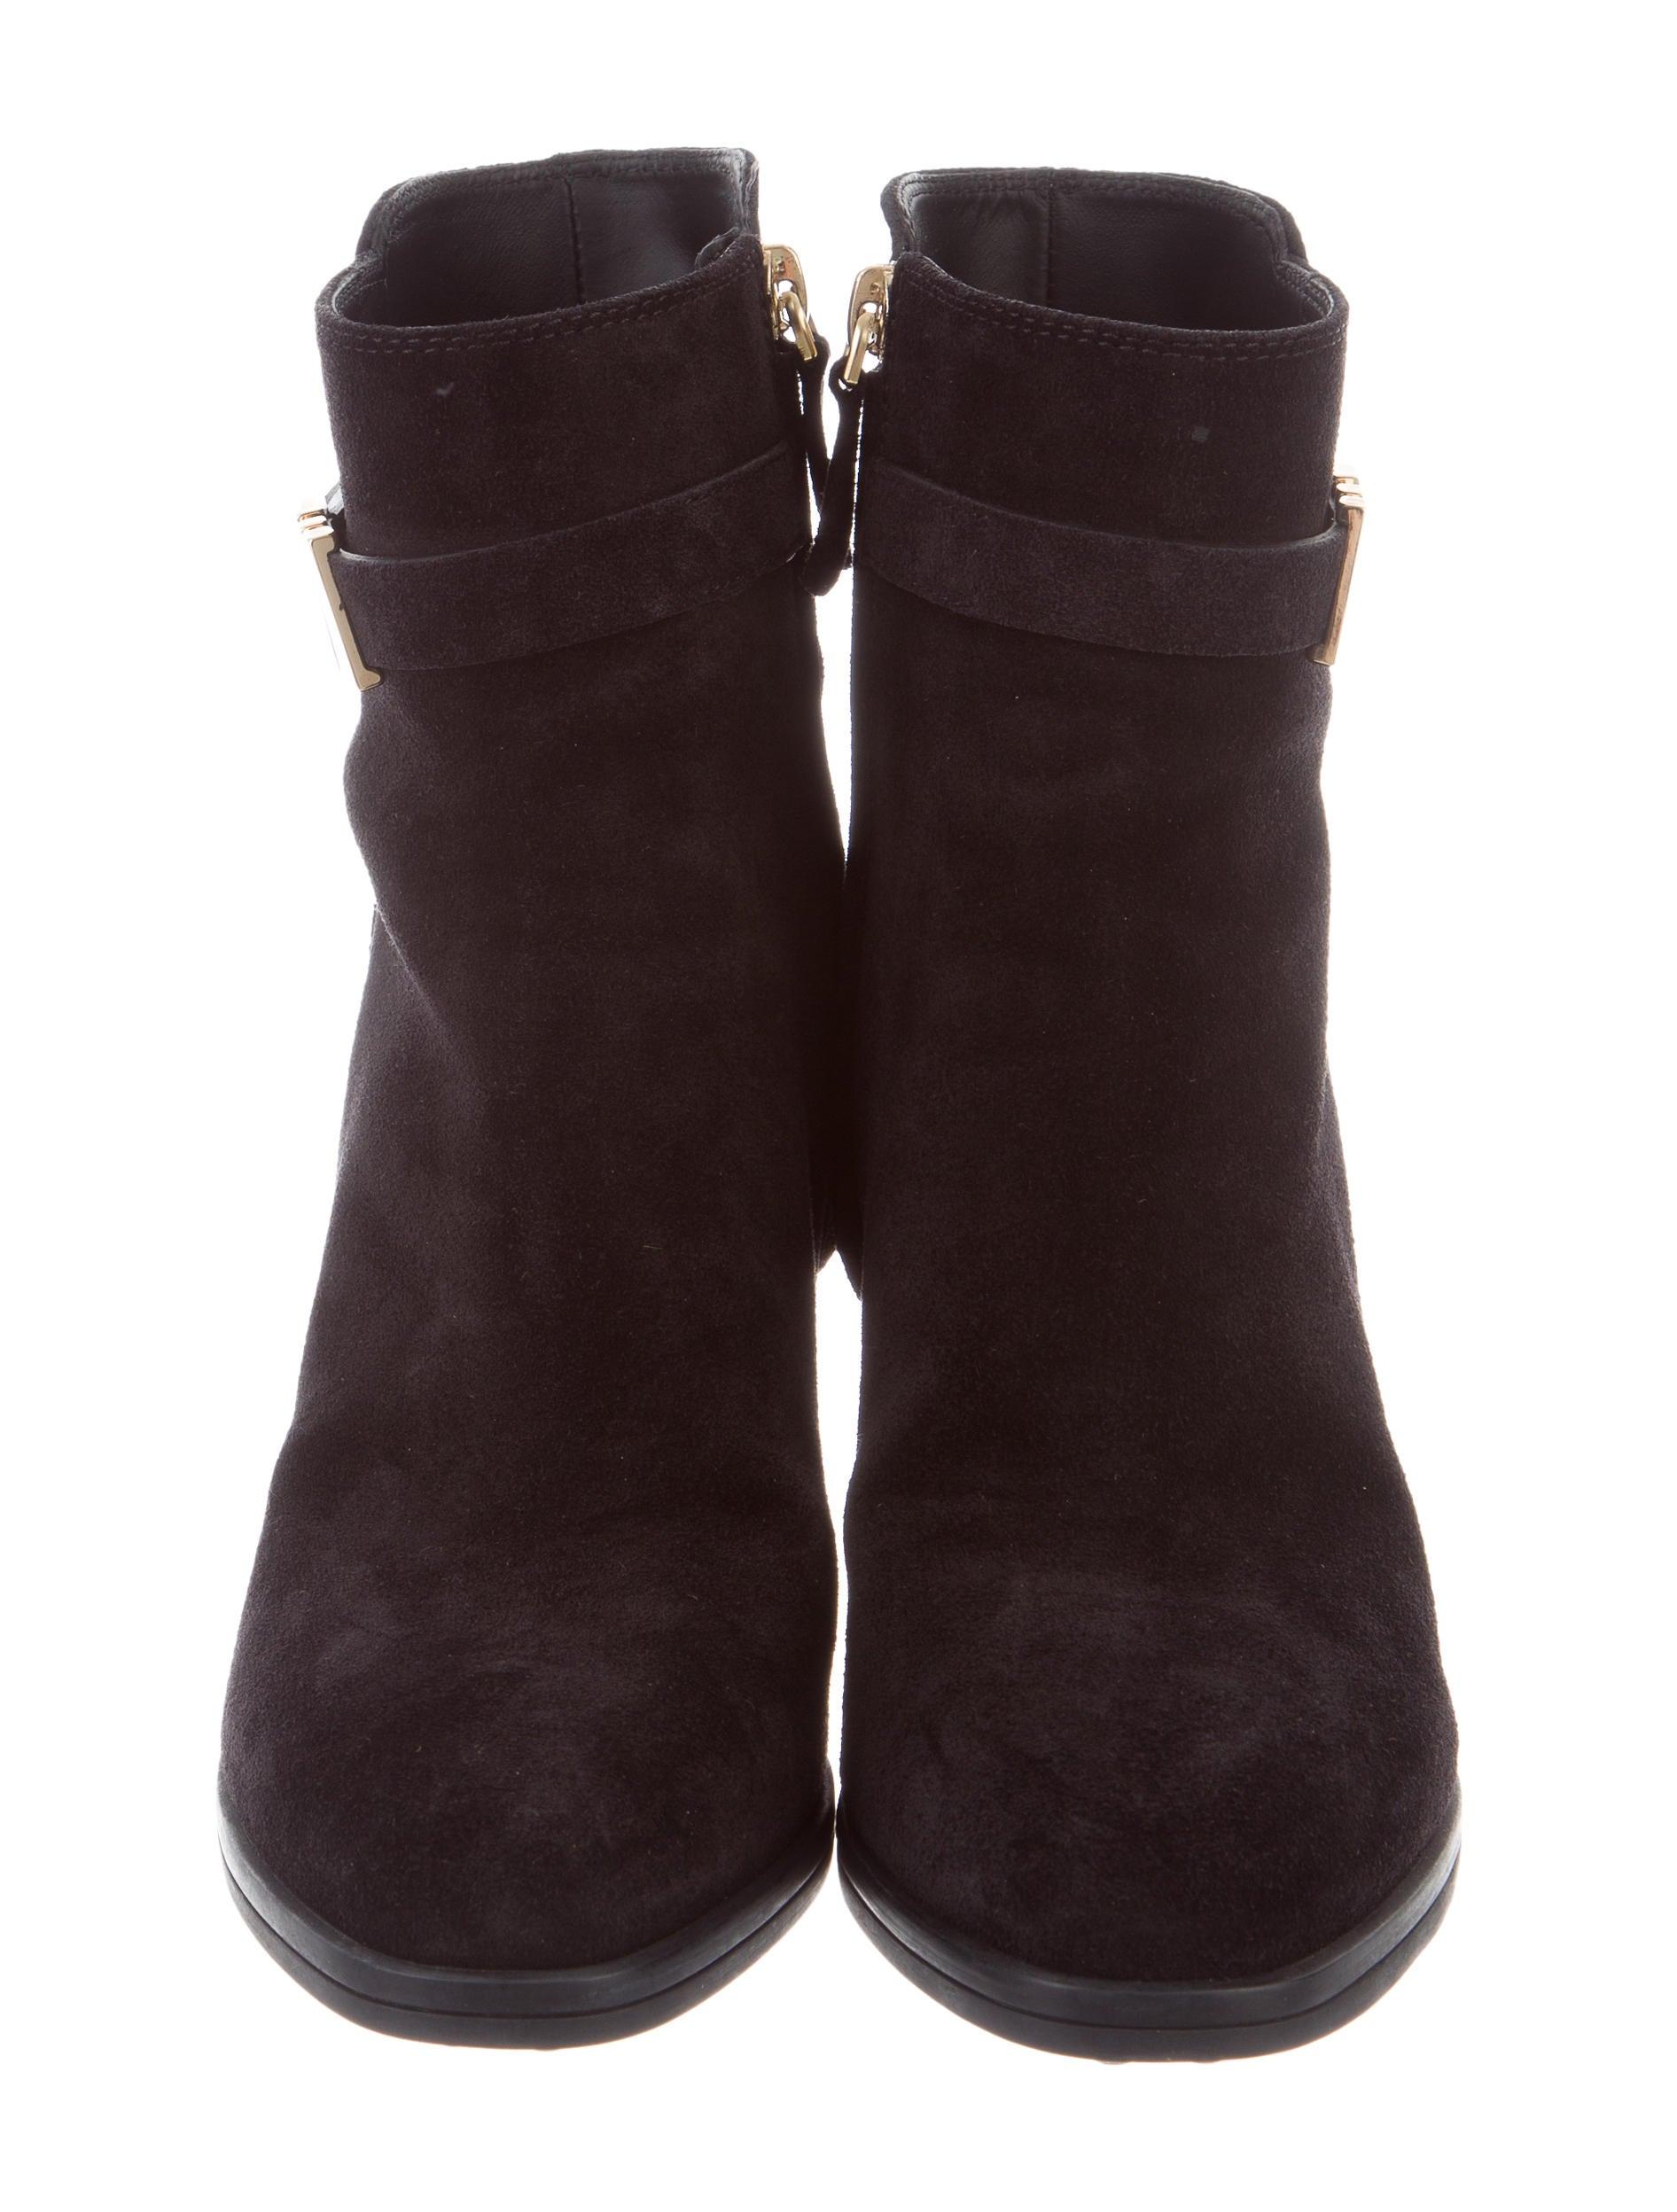 discount footlocker cheap sale brand new unisex Tod's Suede Round-Toe Boots for cheap online best prices sale online cheap USA stockist JbIzyUF6